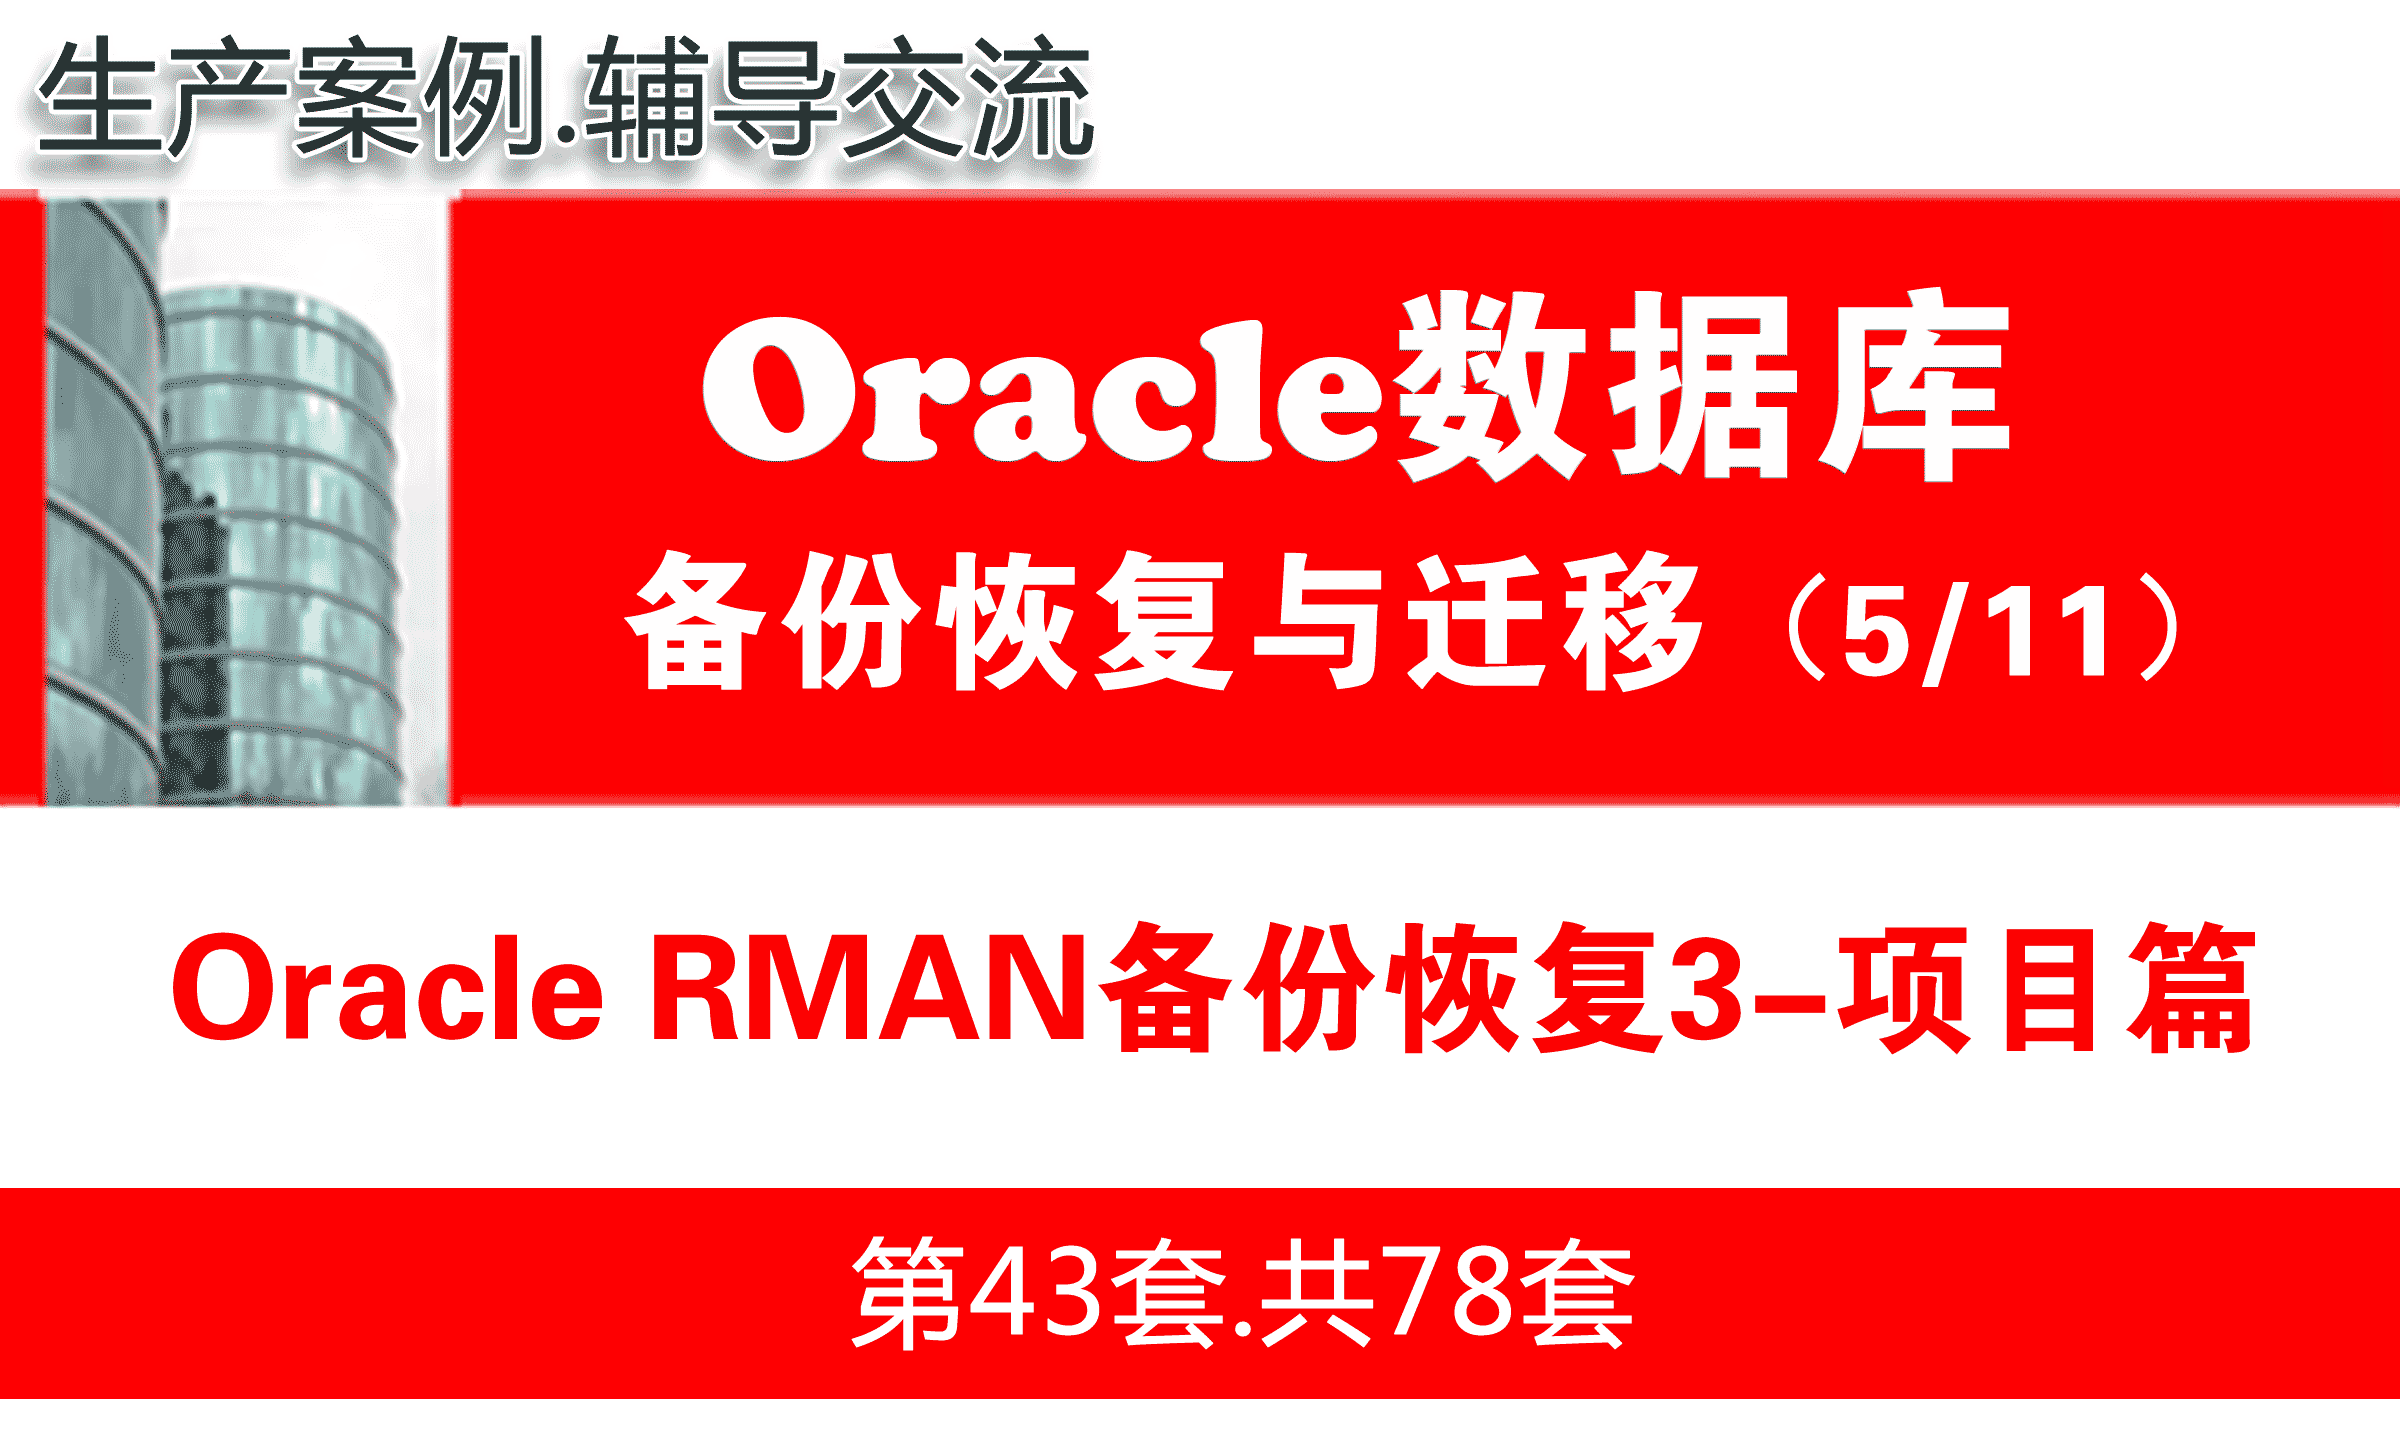 Oracle RMAN备份恢复3(项目篇)_Oracle备份恢复与数据迁移教程05